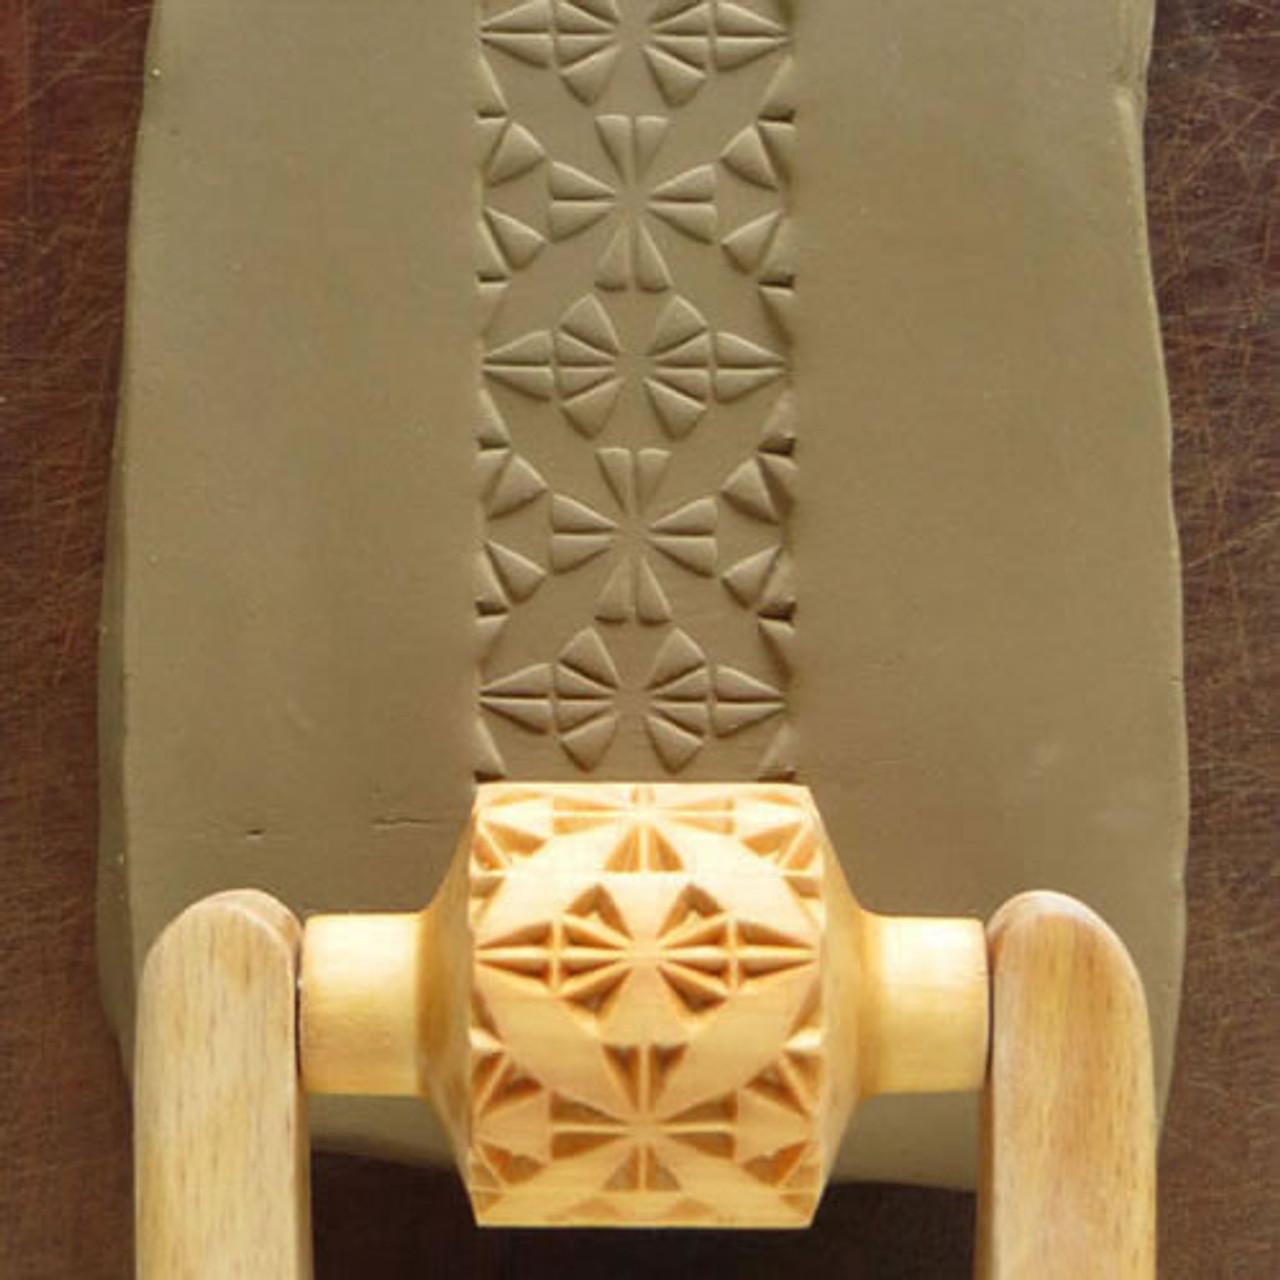 RM-009 Triazzle - 3 cm Roller